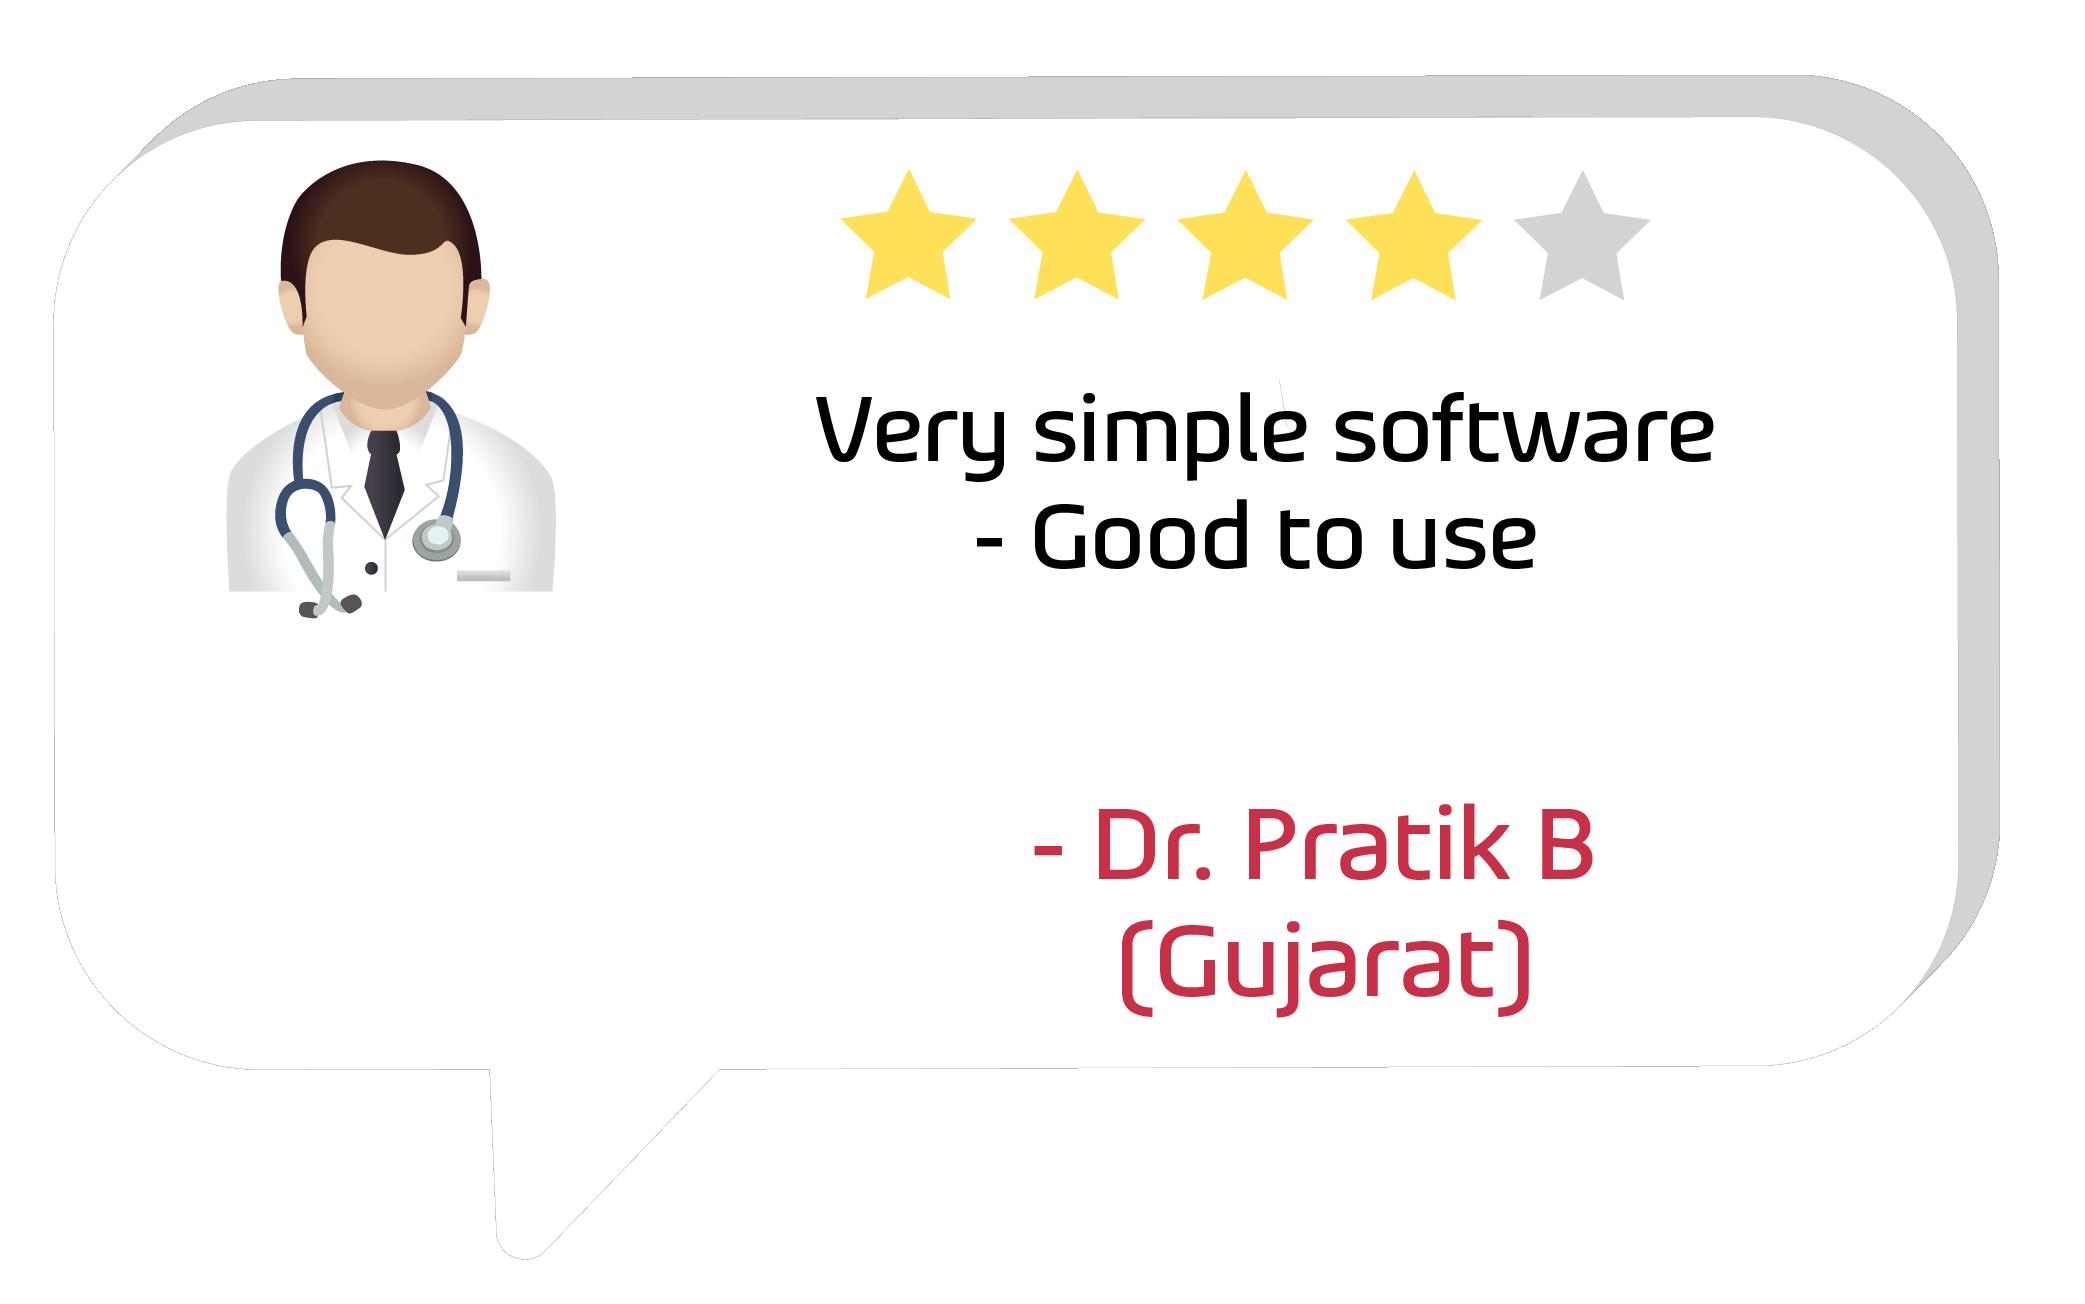 Dr. Pratik B